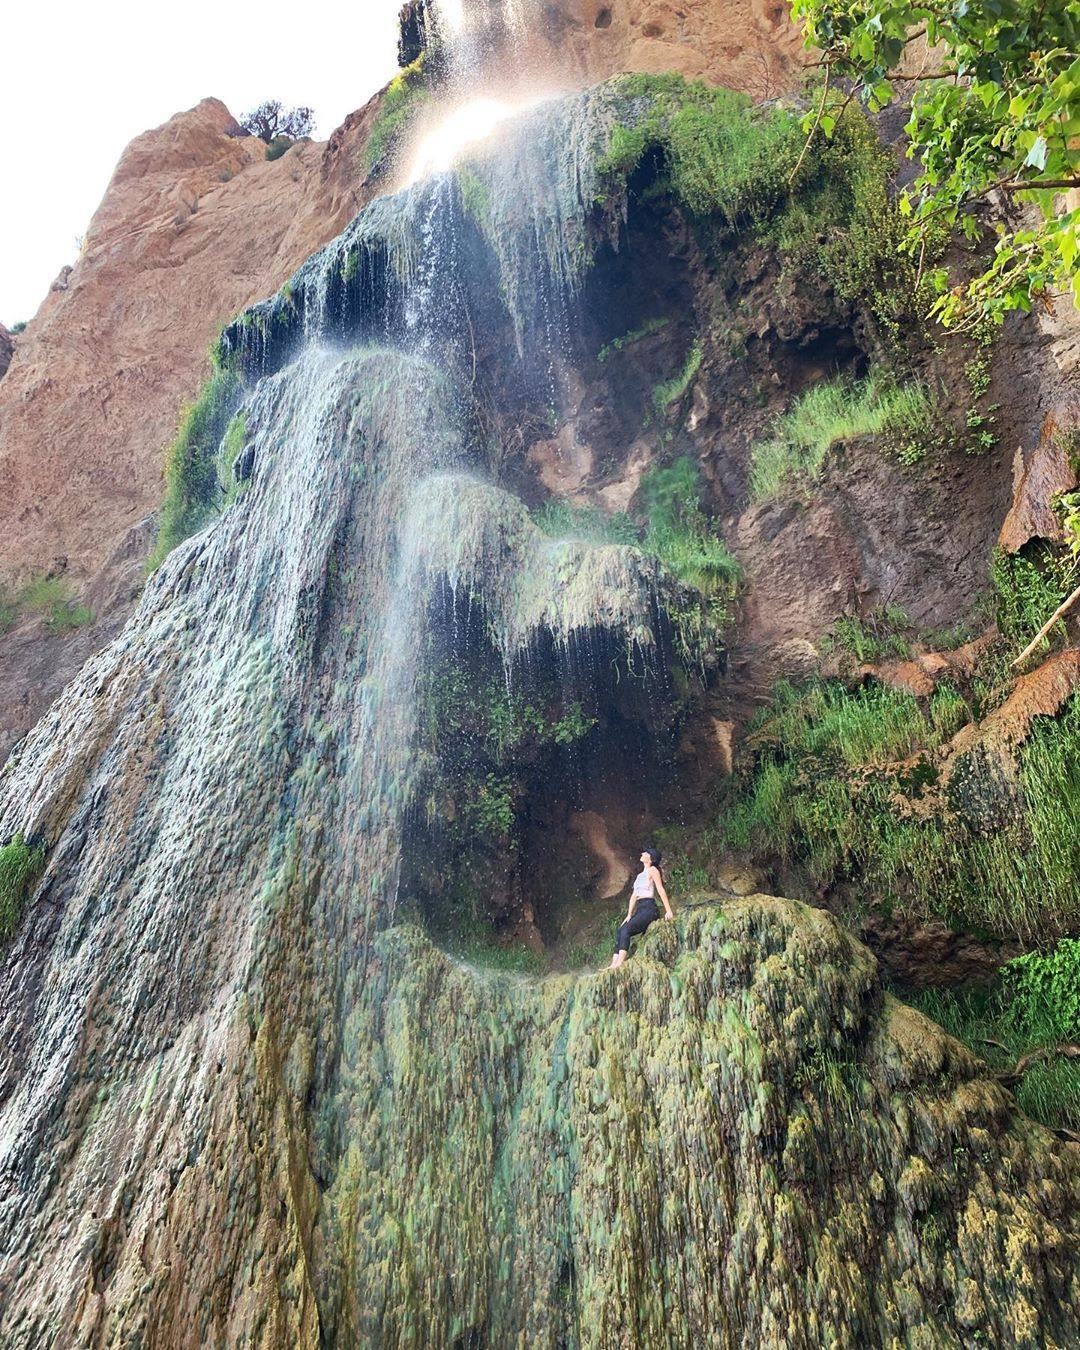 Escondido Falls in Malibu, Summer 2019